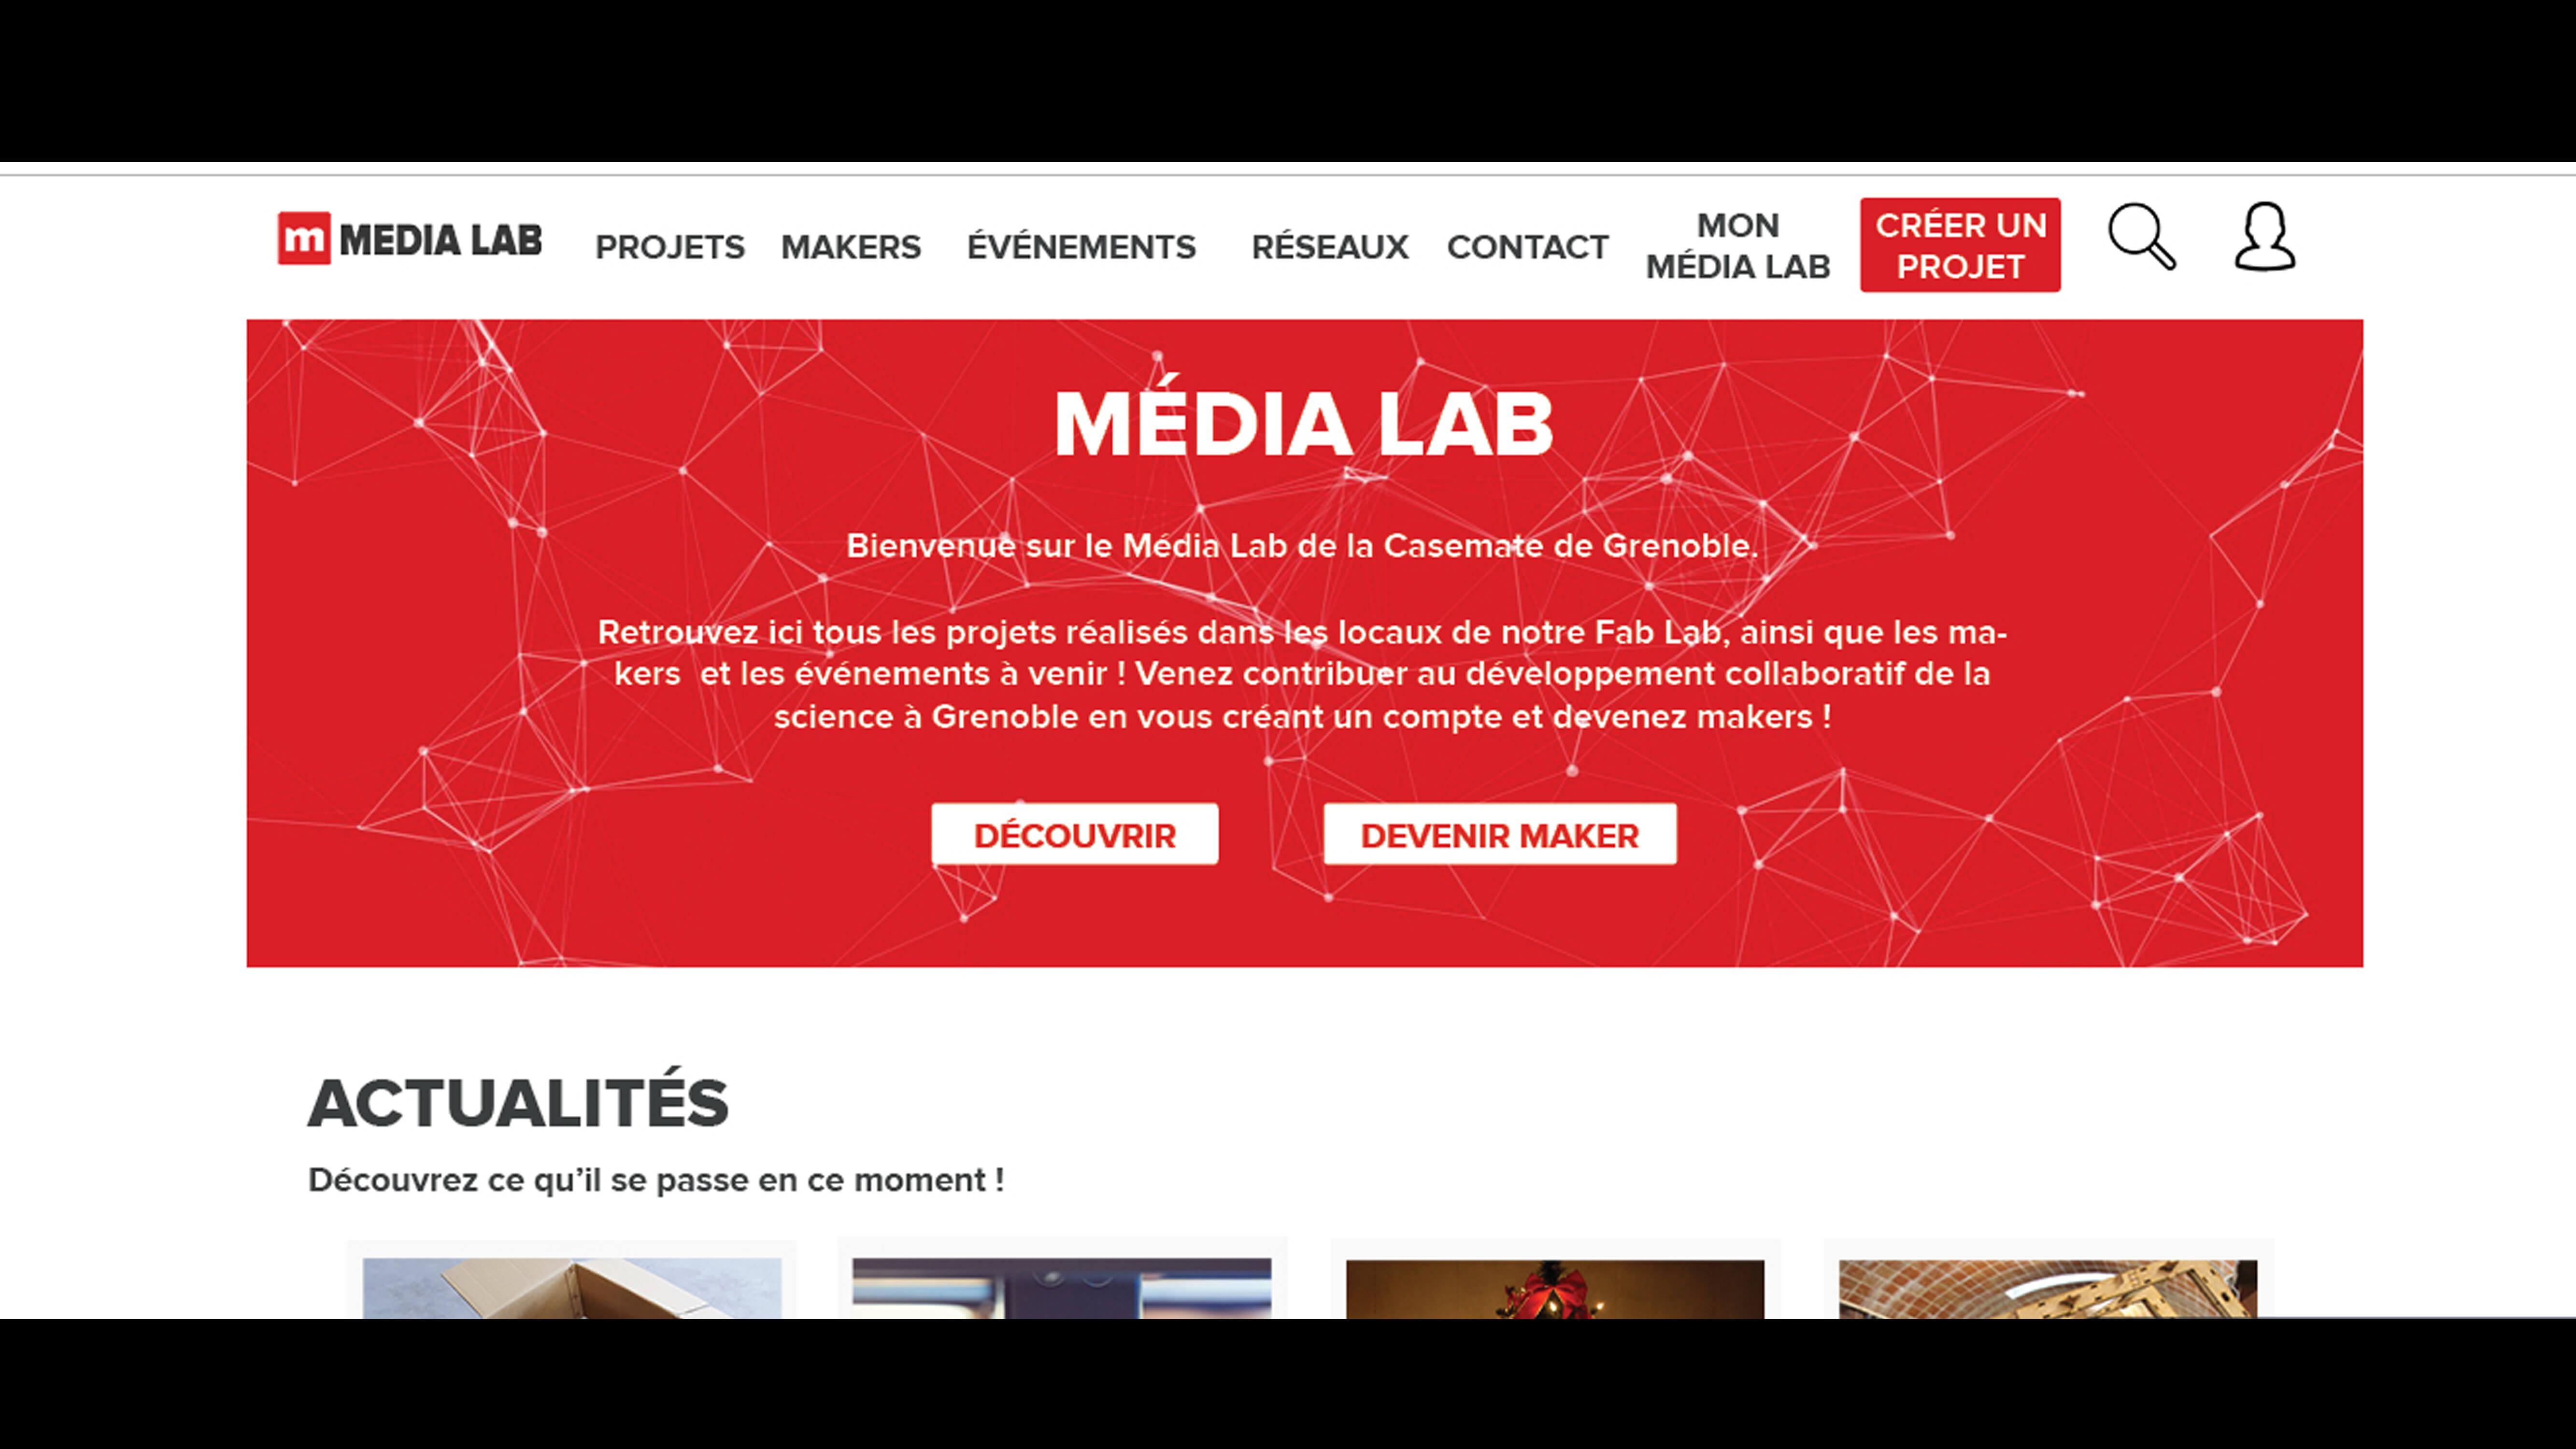 médialab 1 - reduite